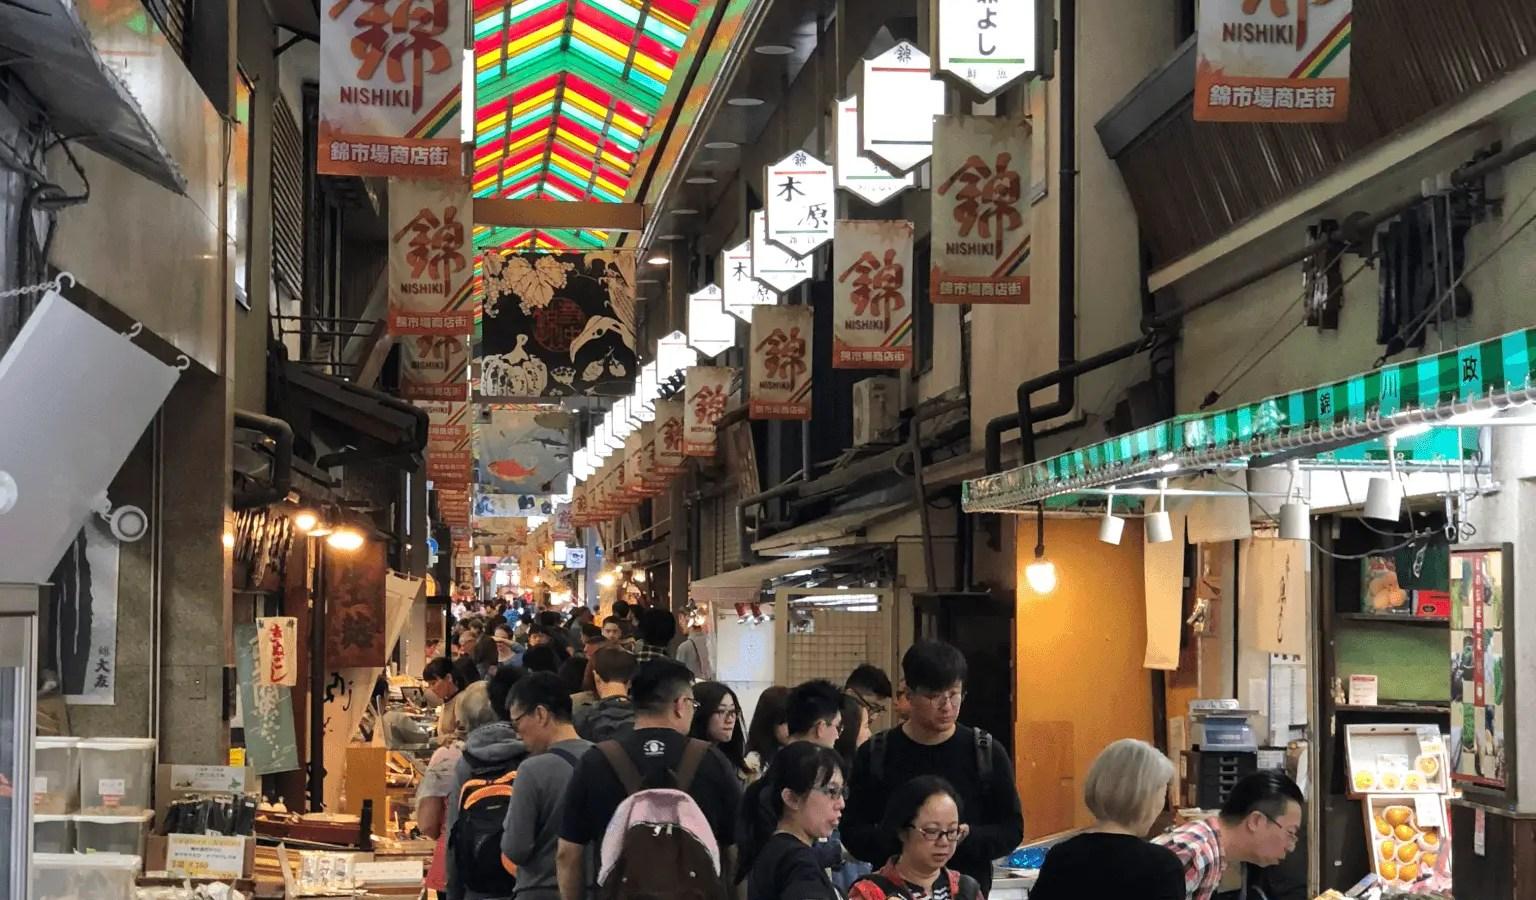 Nashiki Market with stalls of food vendors